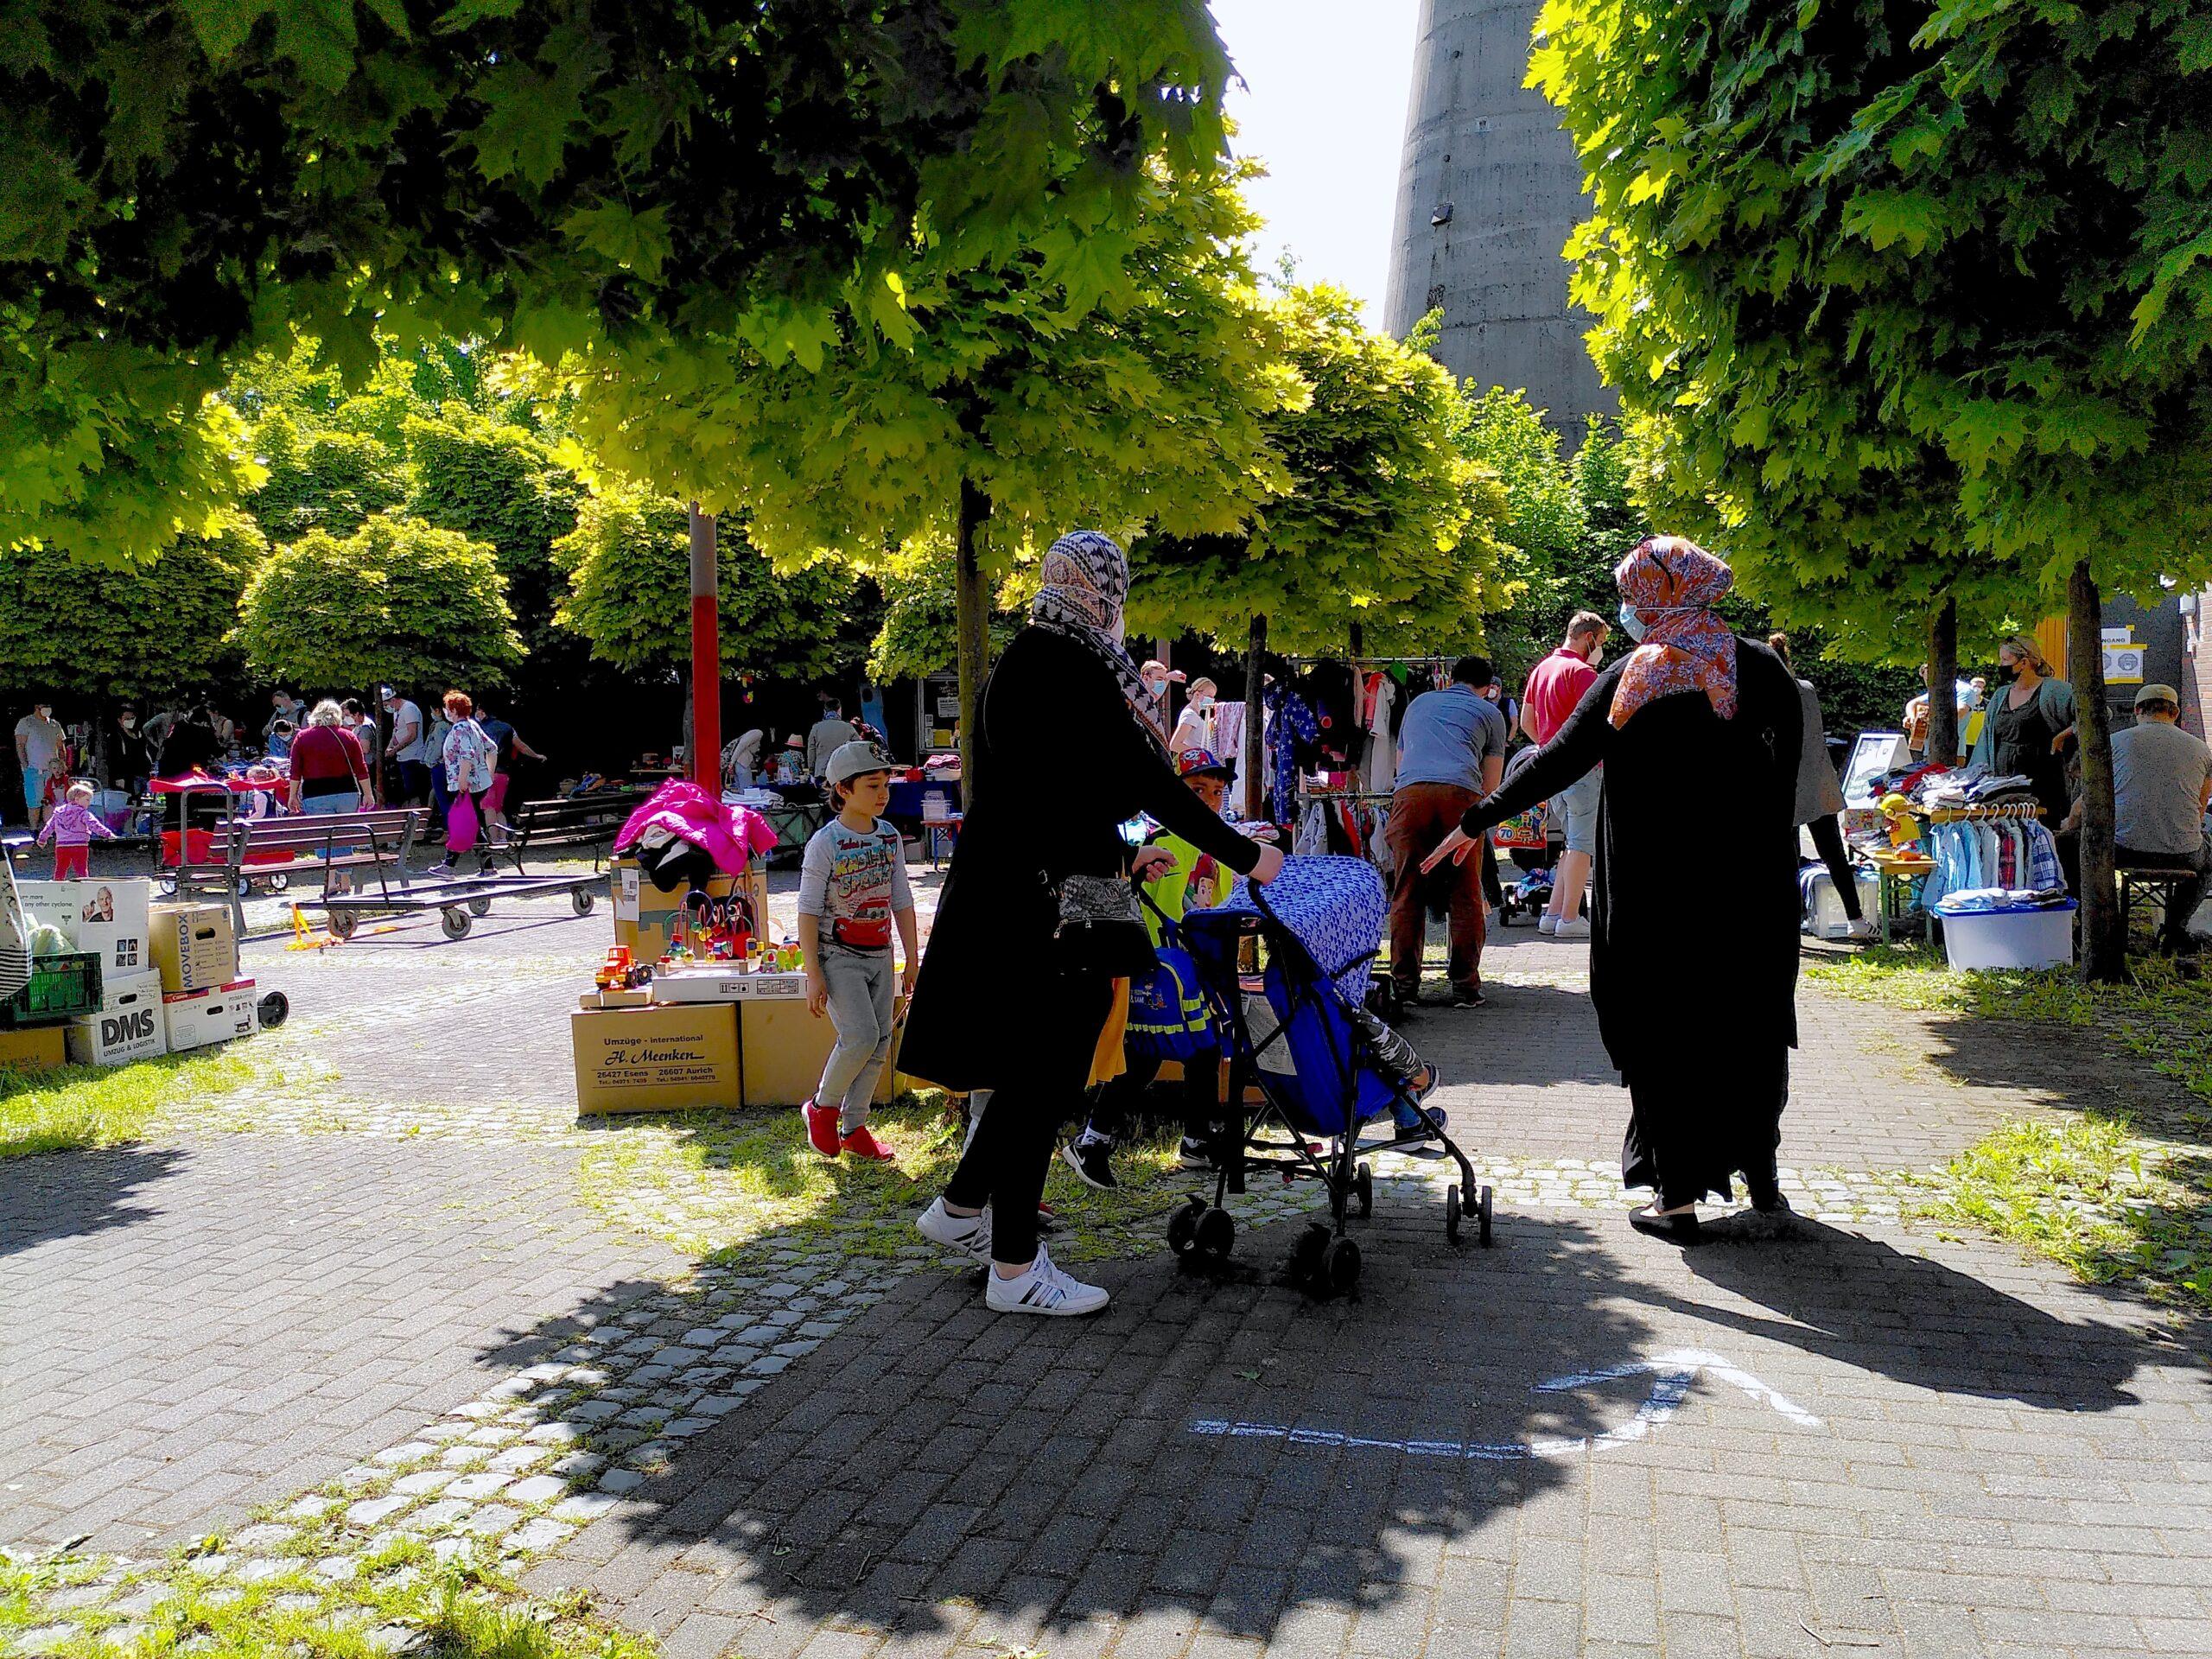 Auf dem Kirchplatz unter den Platanen herrschte buntes Treiben